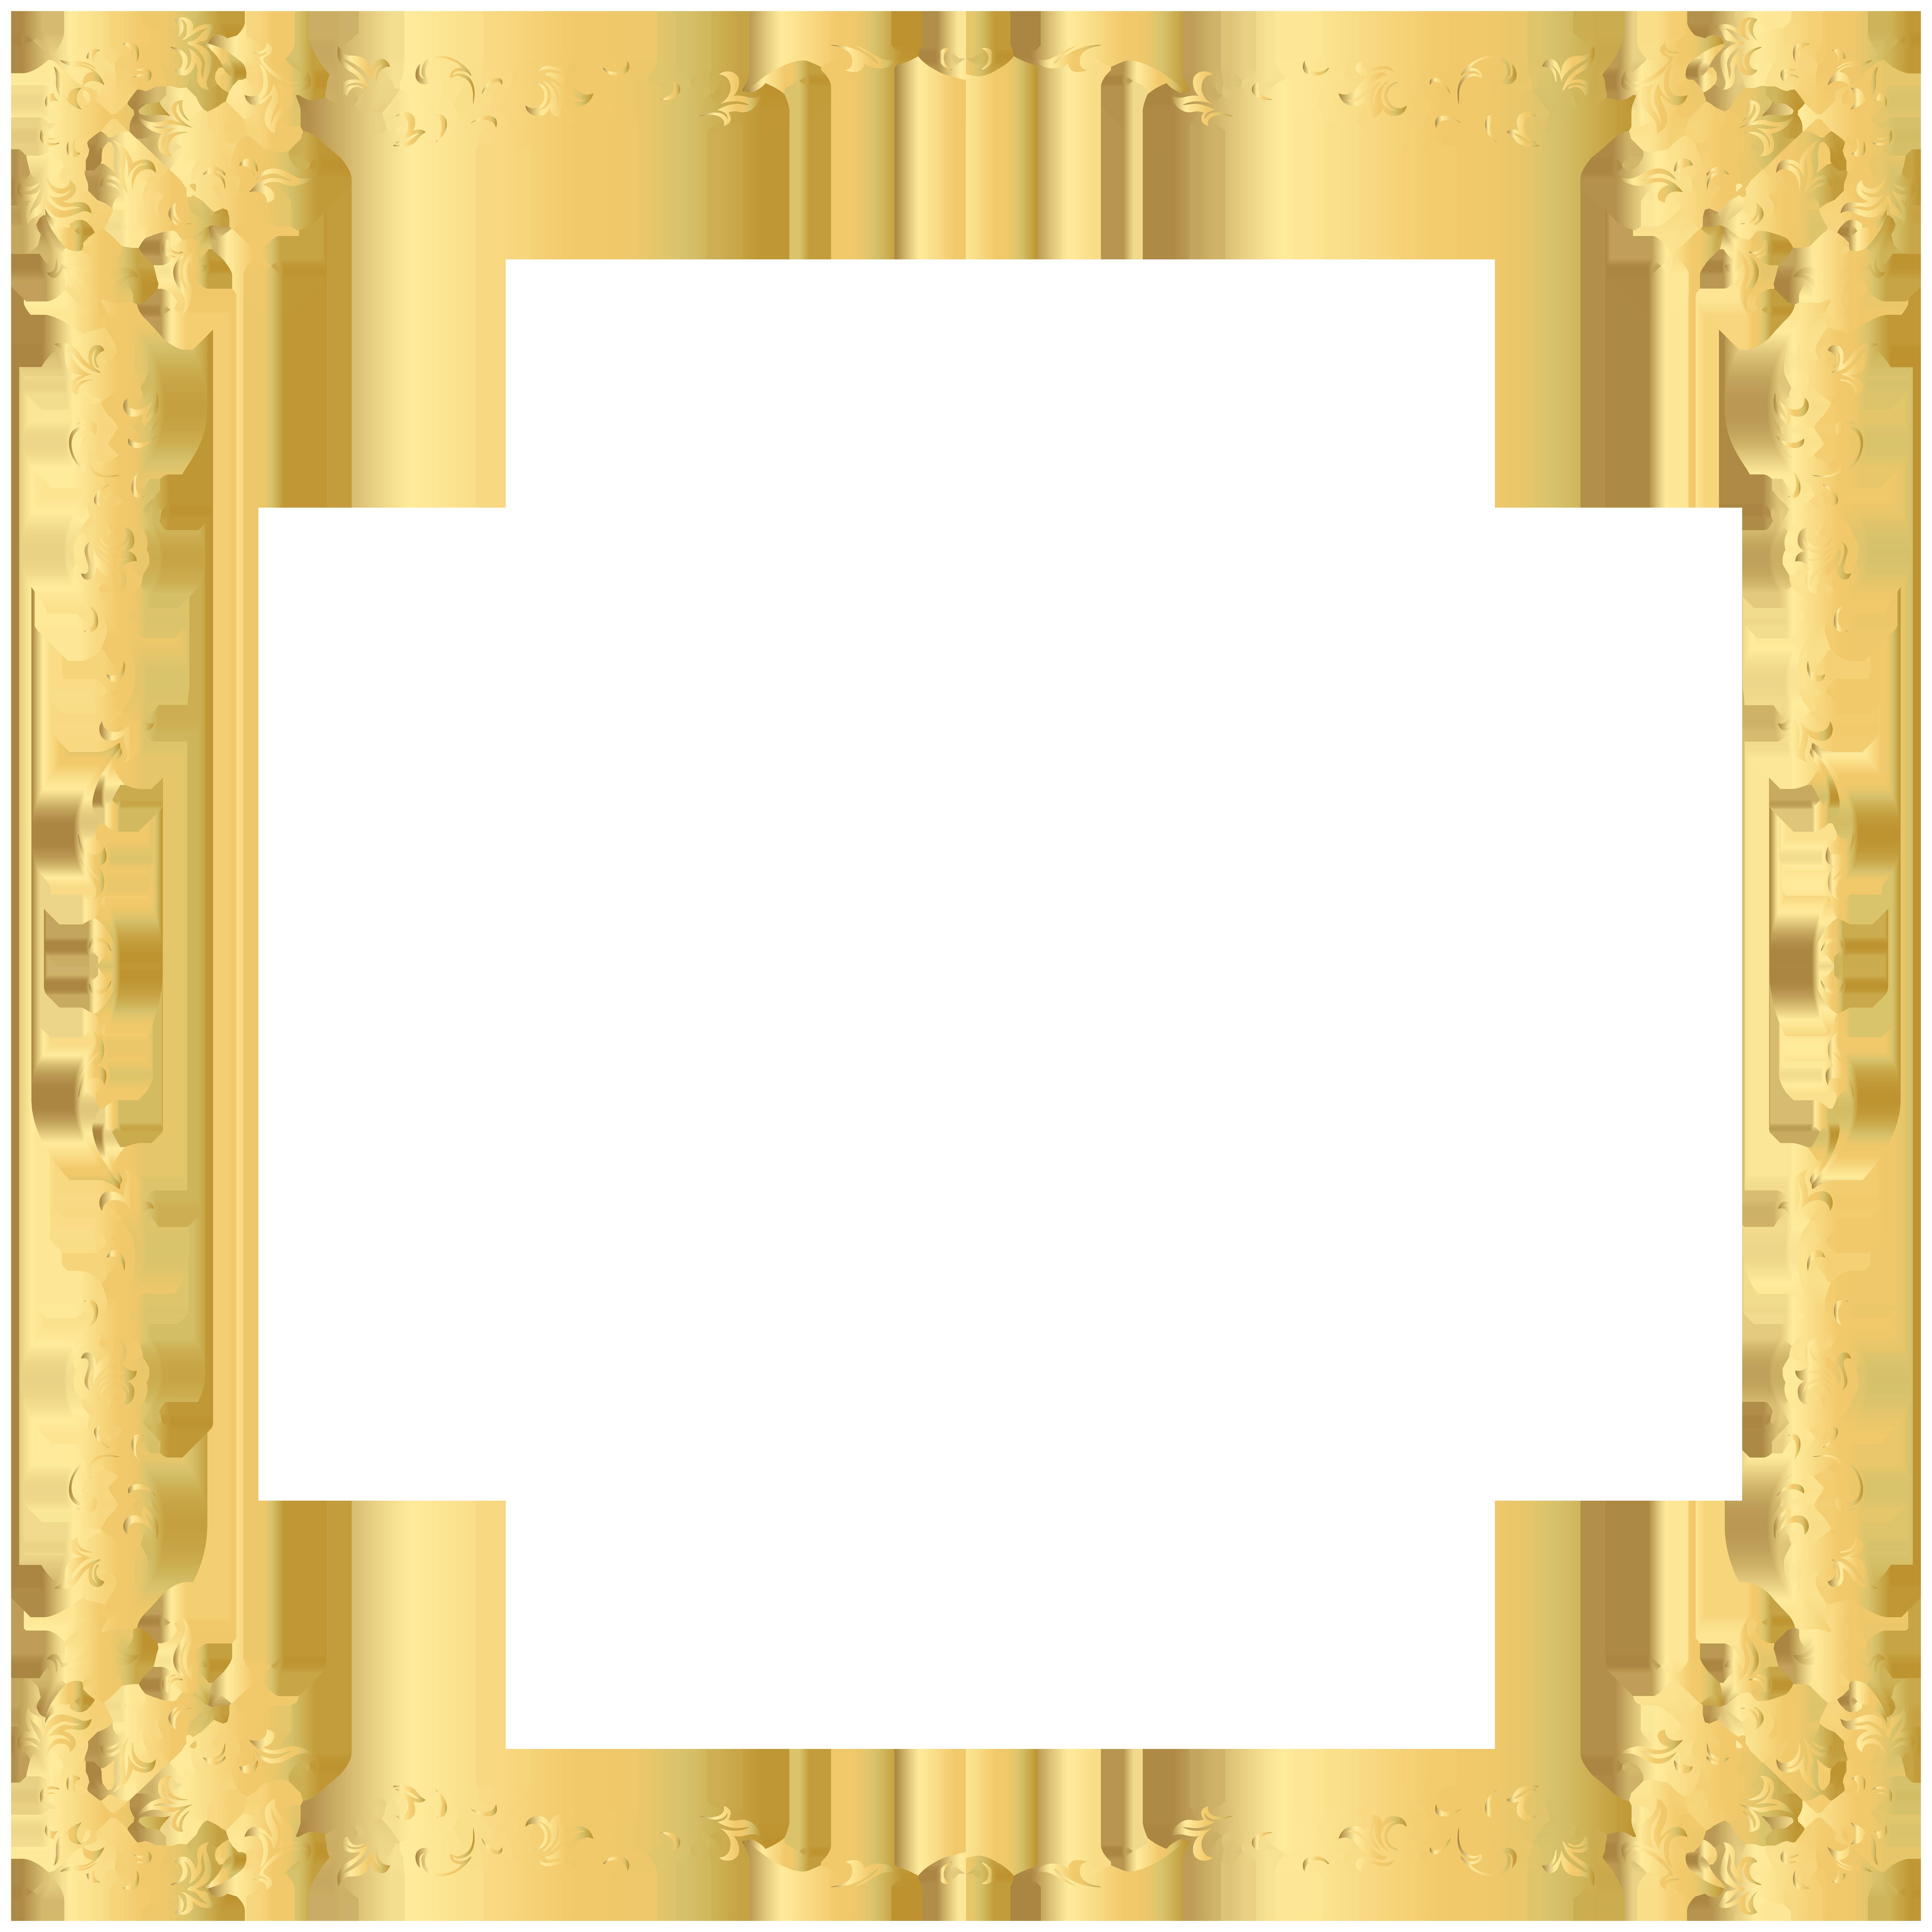 Decorative Transparent Border PNG Image กรอบ